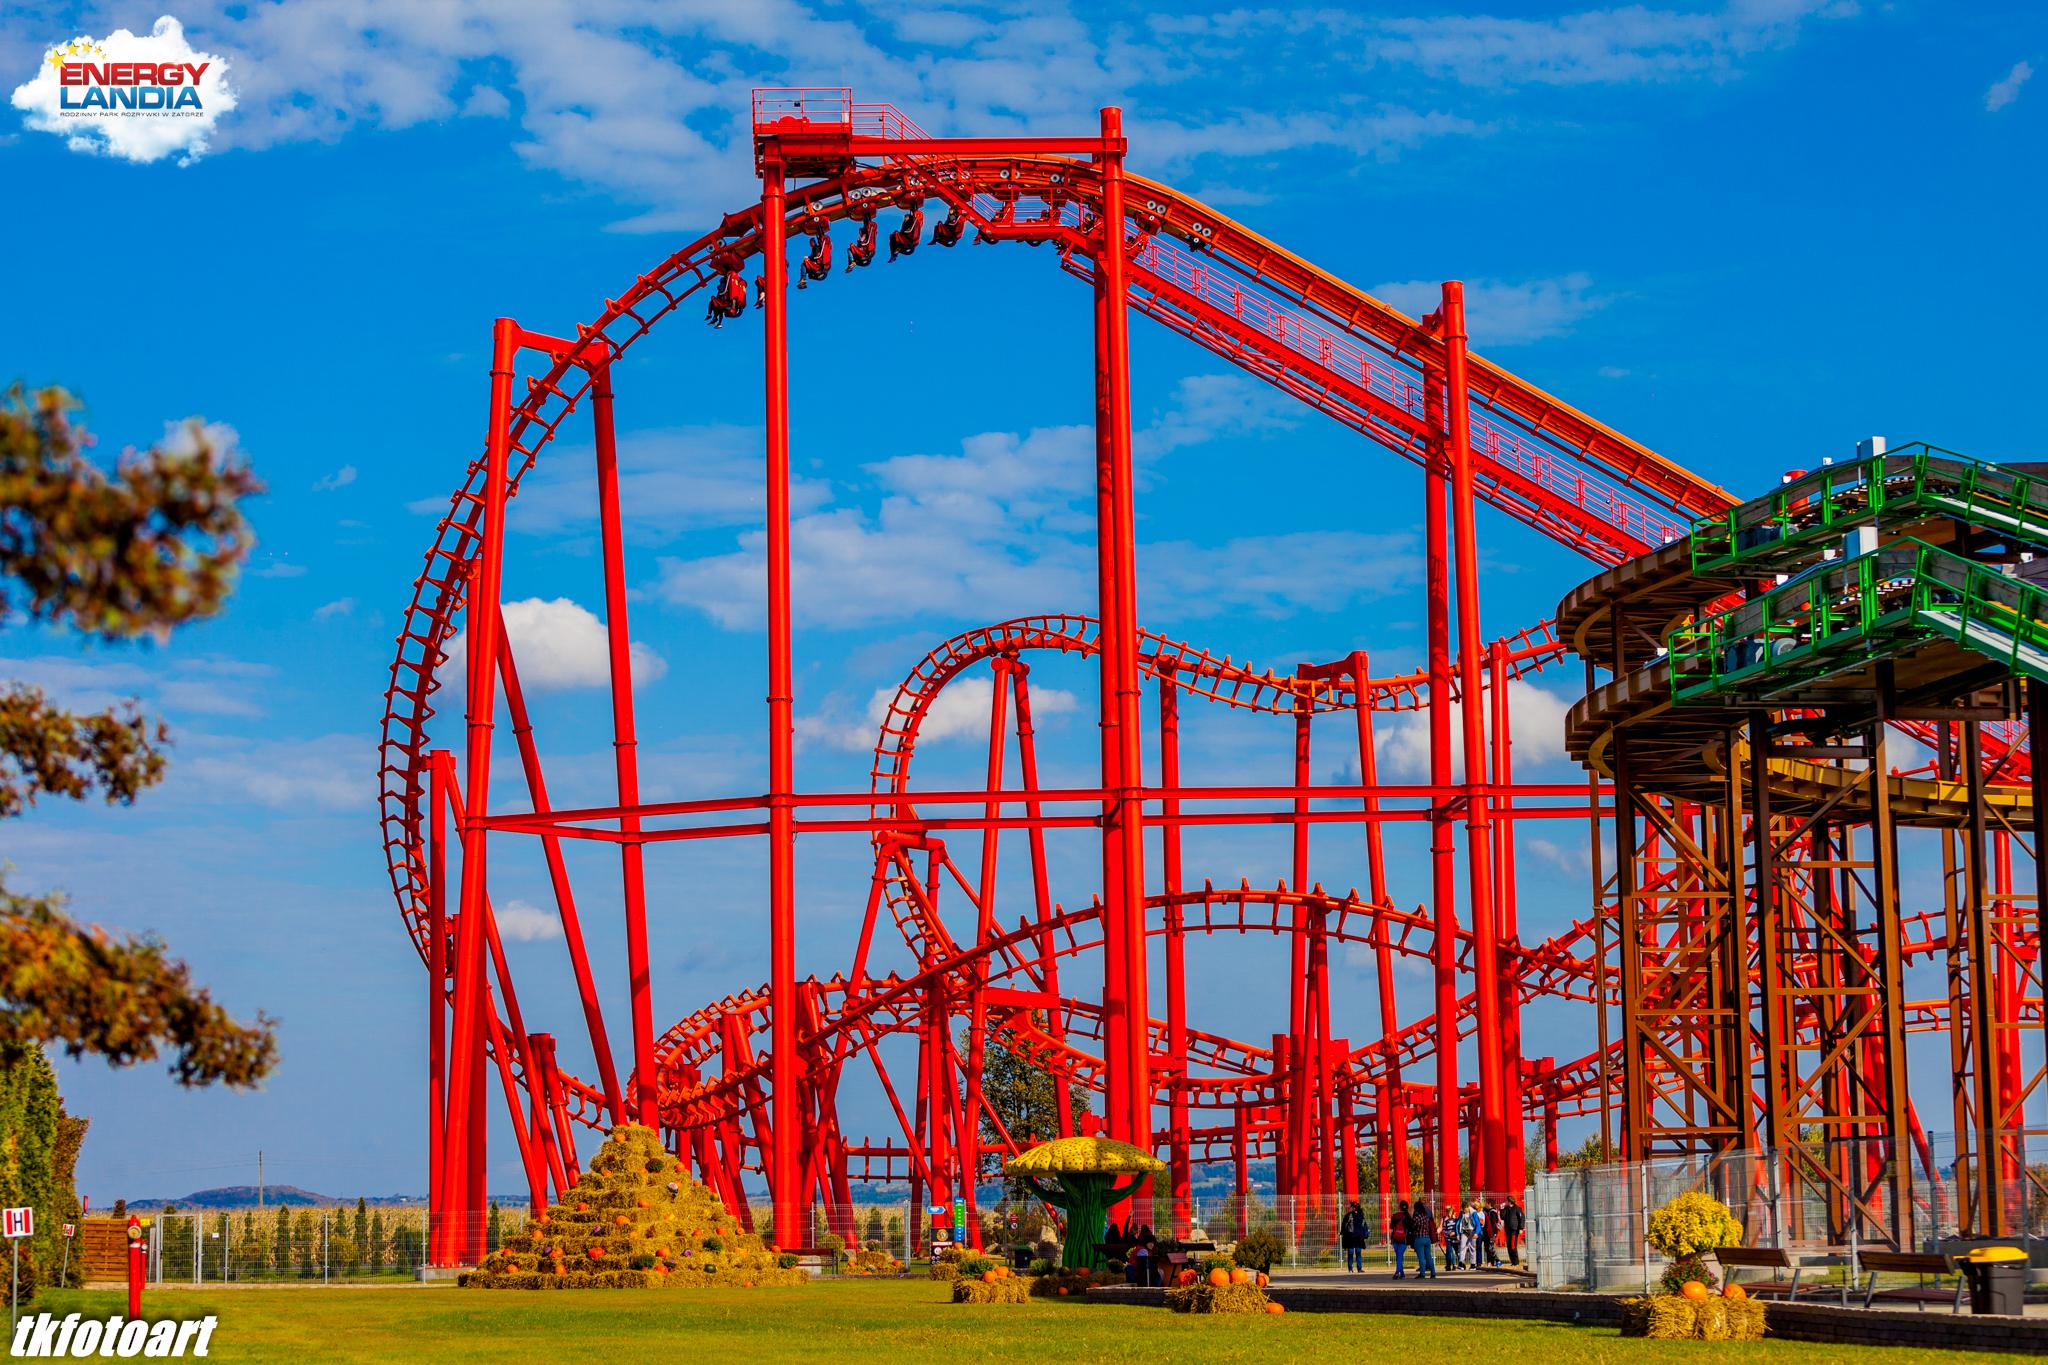 Roller Coaster Mayan ENERGYLANDIA Rodzinny Park Rozrywki